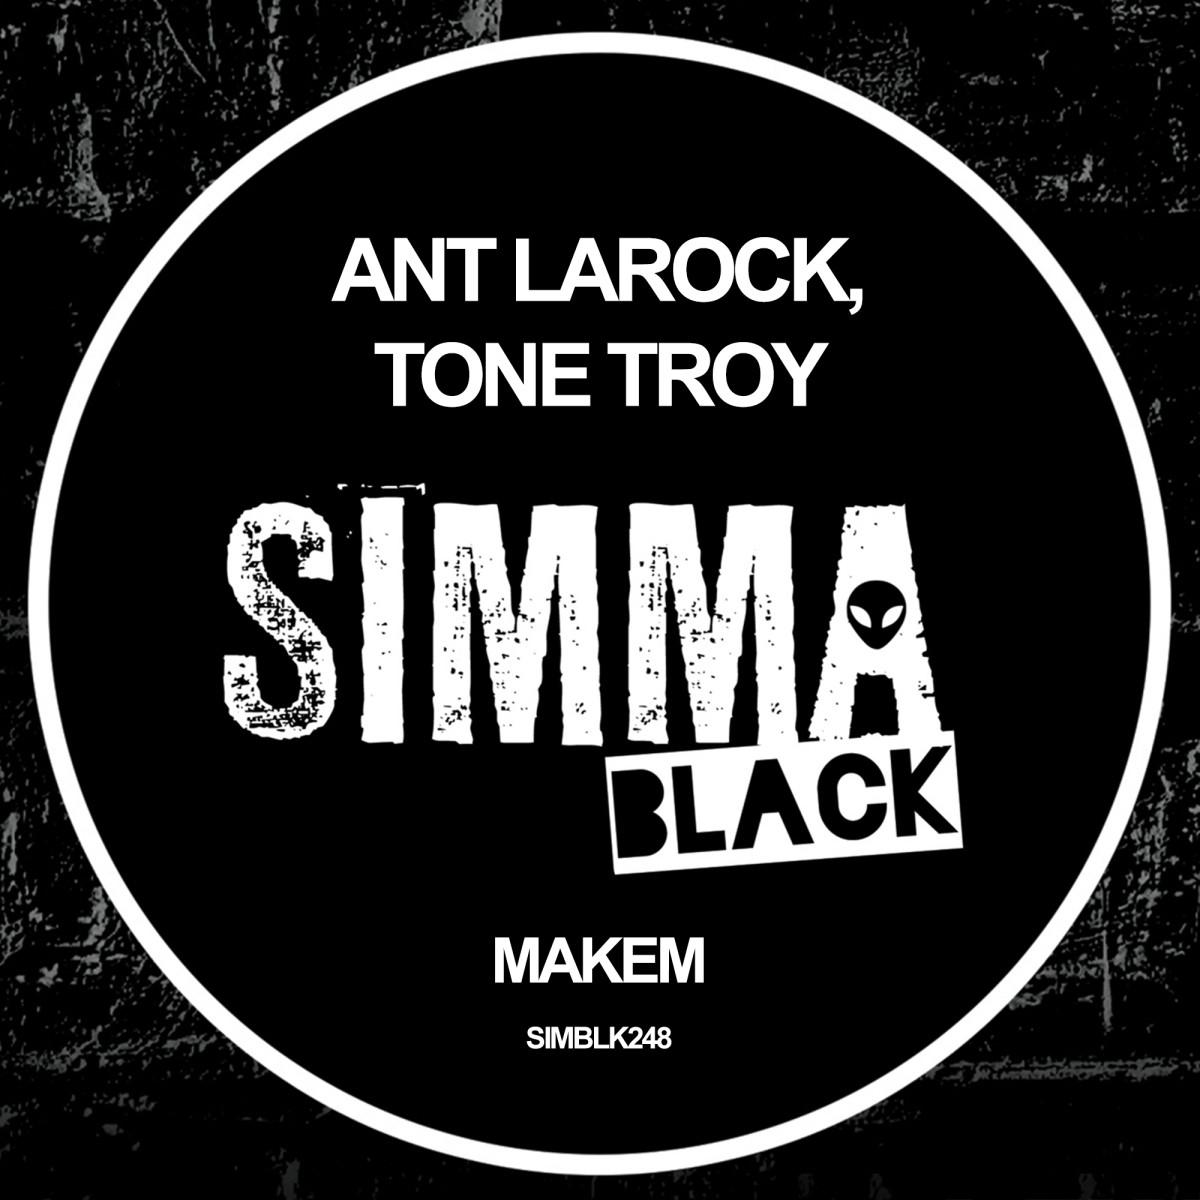 Ant La Rock, Tone Troy - Makem [Simma Black]